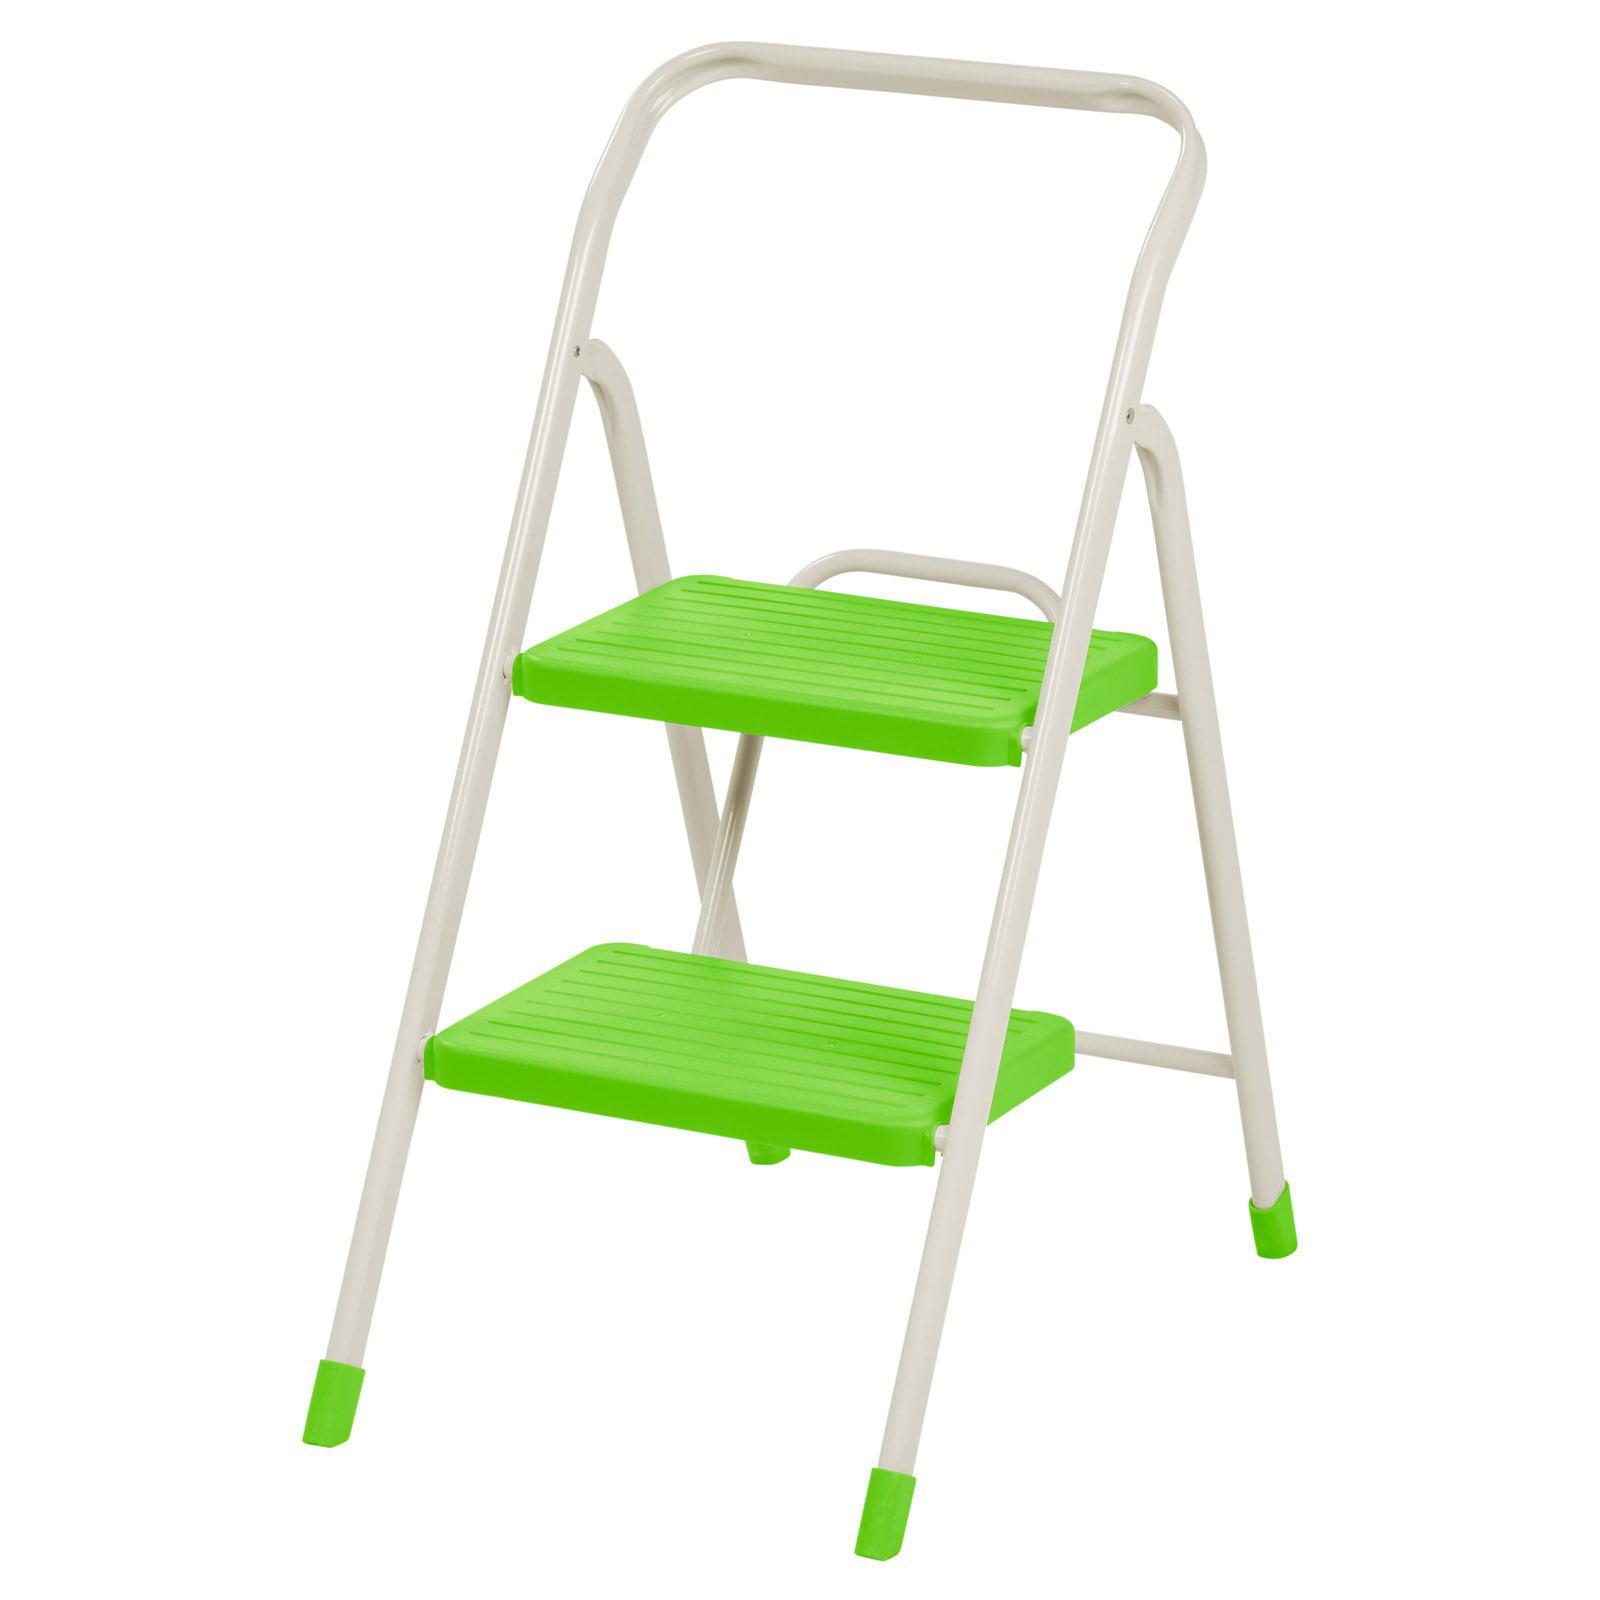 Incredible Iris 3 Step Folding Step Stool Pink Alphanode Cool Chair Designs And Ideas Alphanodeonline